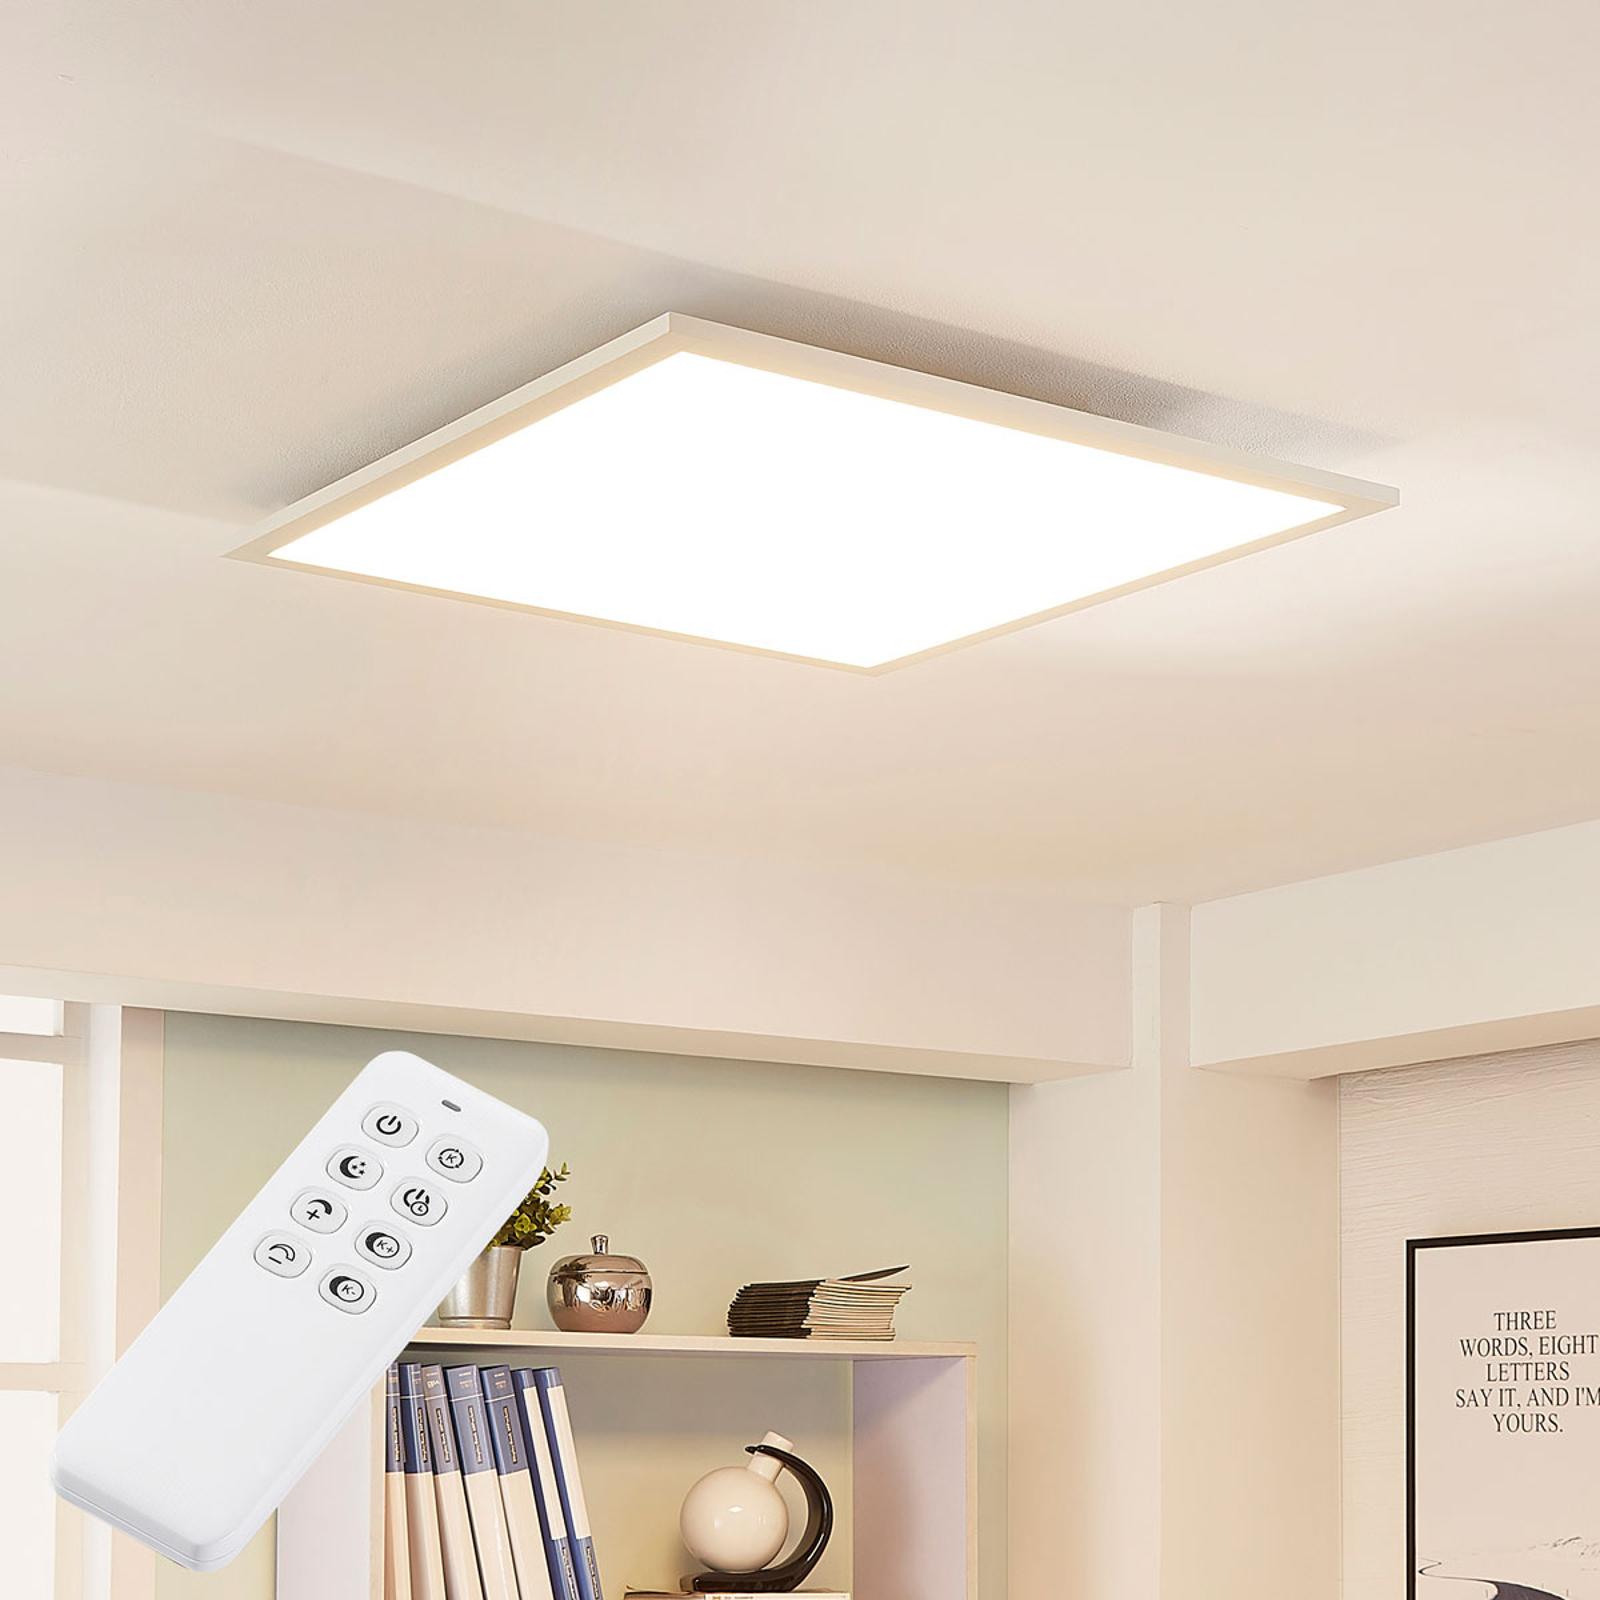 Kvadratisk LED-taklampe Lysander med dimmer